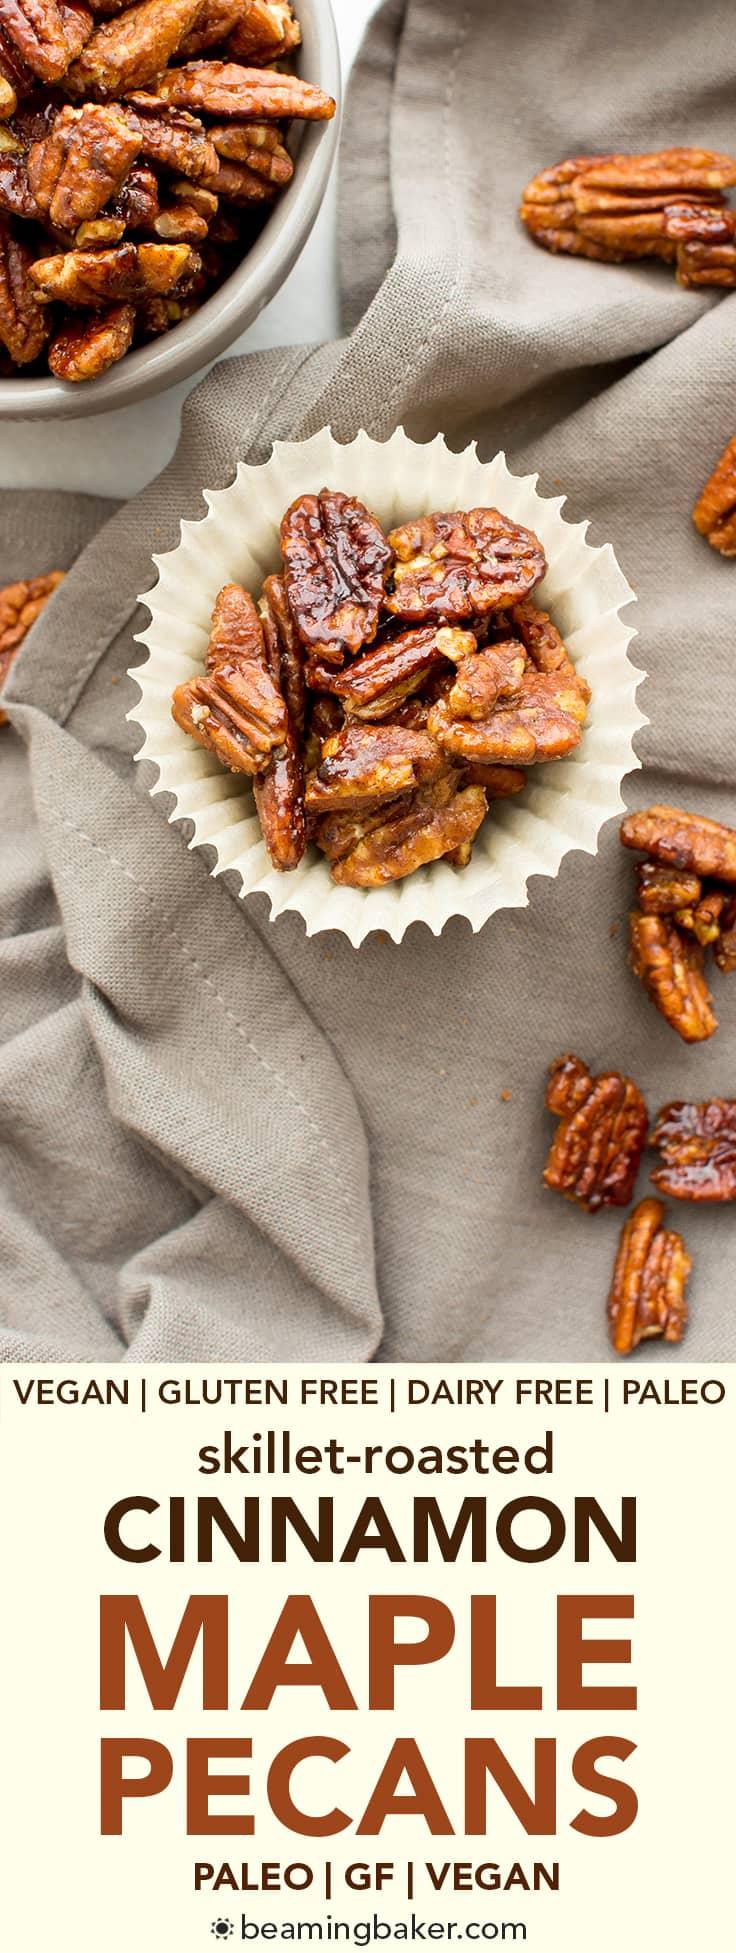 Skillet-Roasted Maple Cinnamon Pecans (V, GF, Paleo): a 6-ingredient recipe for warm, cozy skillet-roasted pecans glazed with coconut sugar and cinnamon. #Paleo #Vegan #GlutenFree #DairyFree | BeamingBaker.com